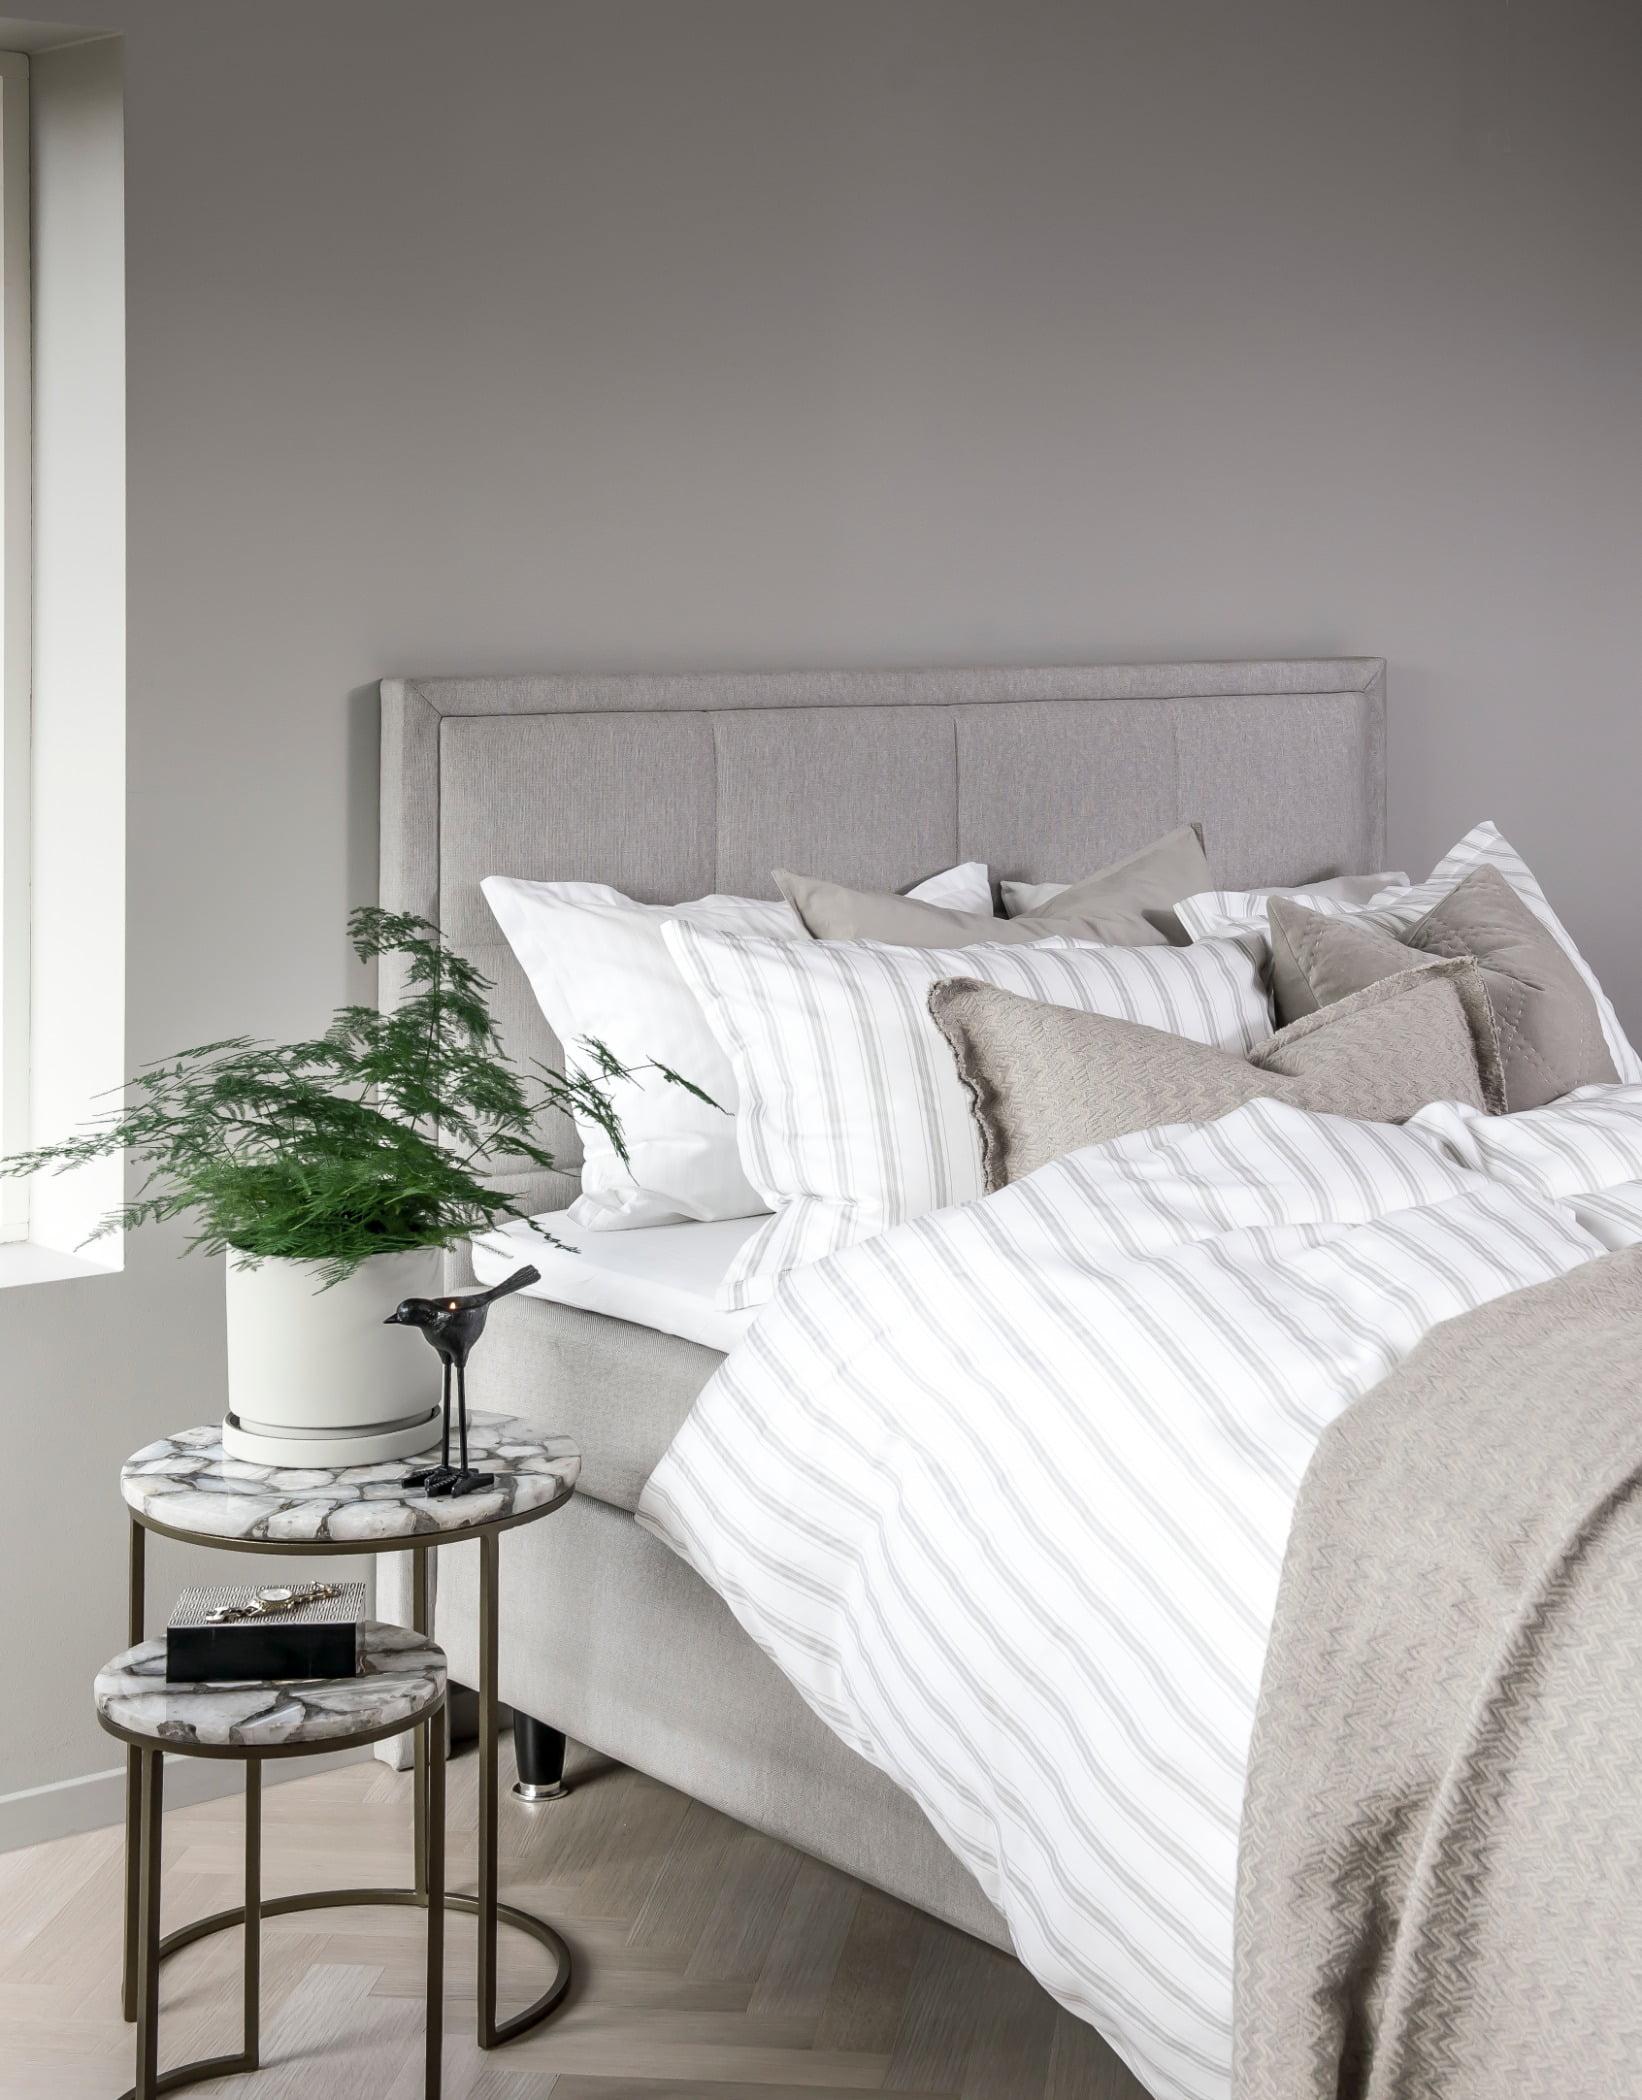 Bed frame, Interior design, Furniture, Plant, Comfort, Pillow, Shade, Lamp, Grey, Houseplant